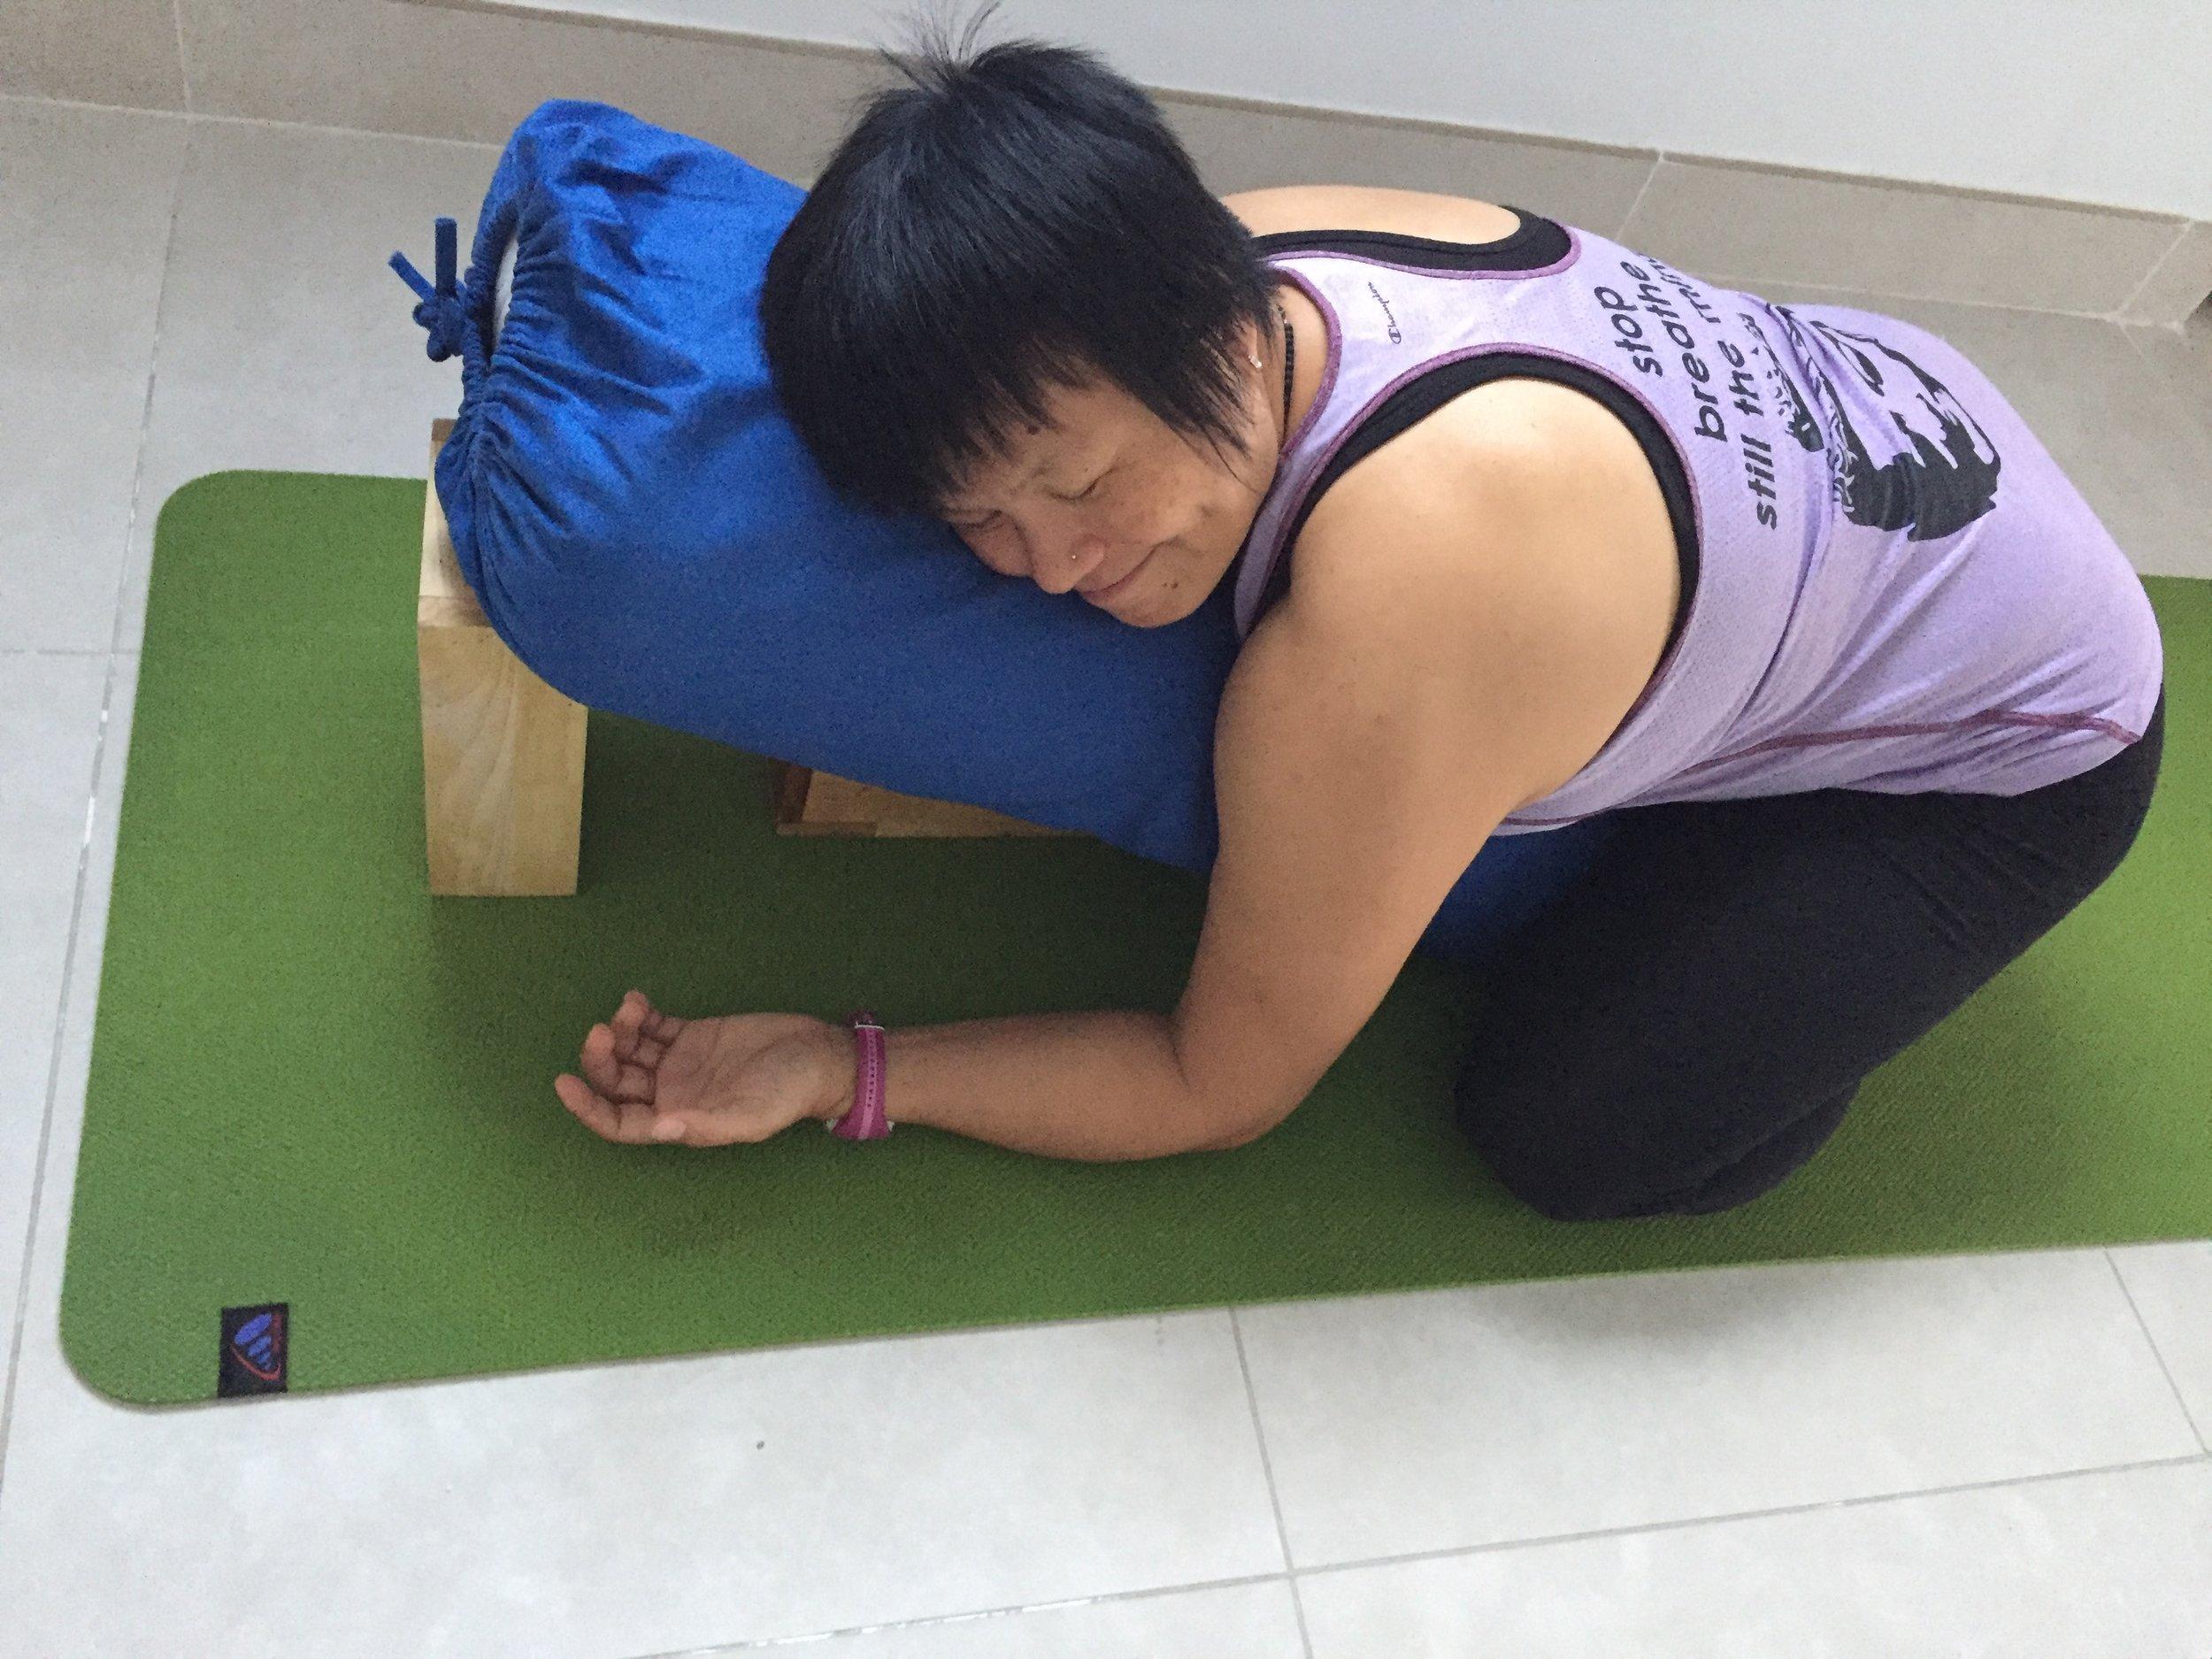 restorative-yoga-training-ho-chi-minh-city-saigon-vietnam